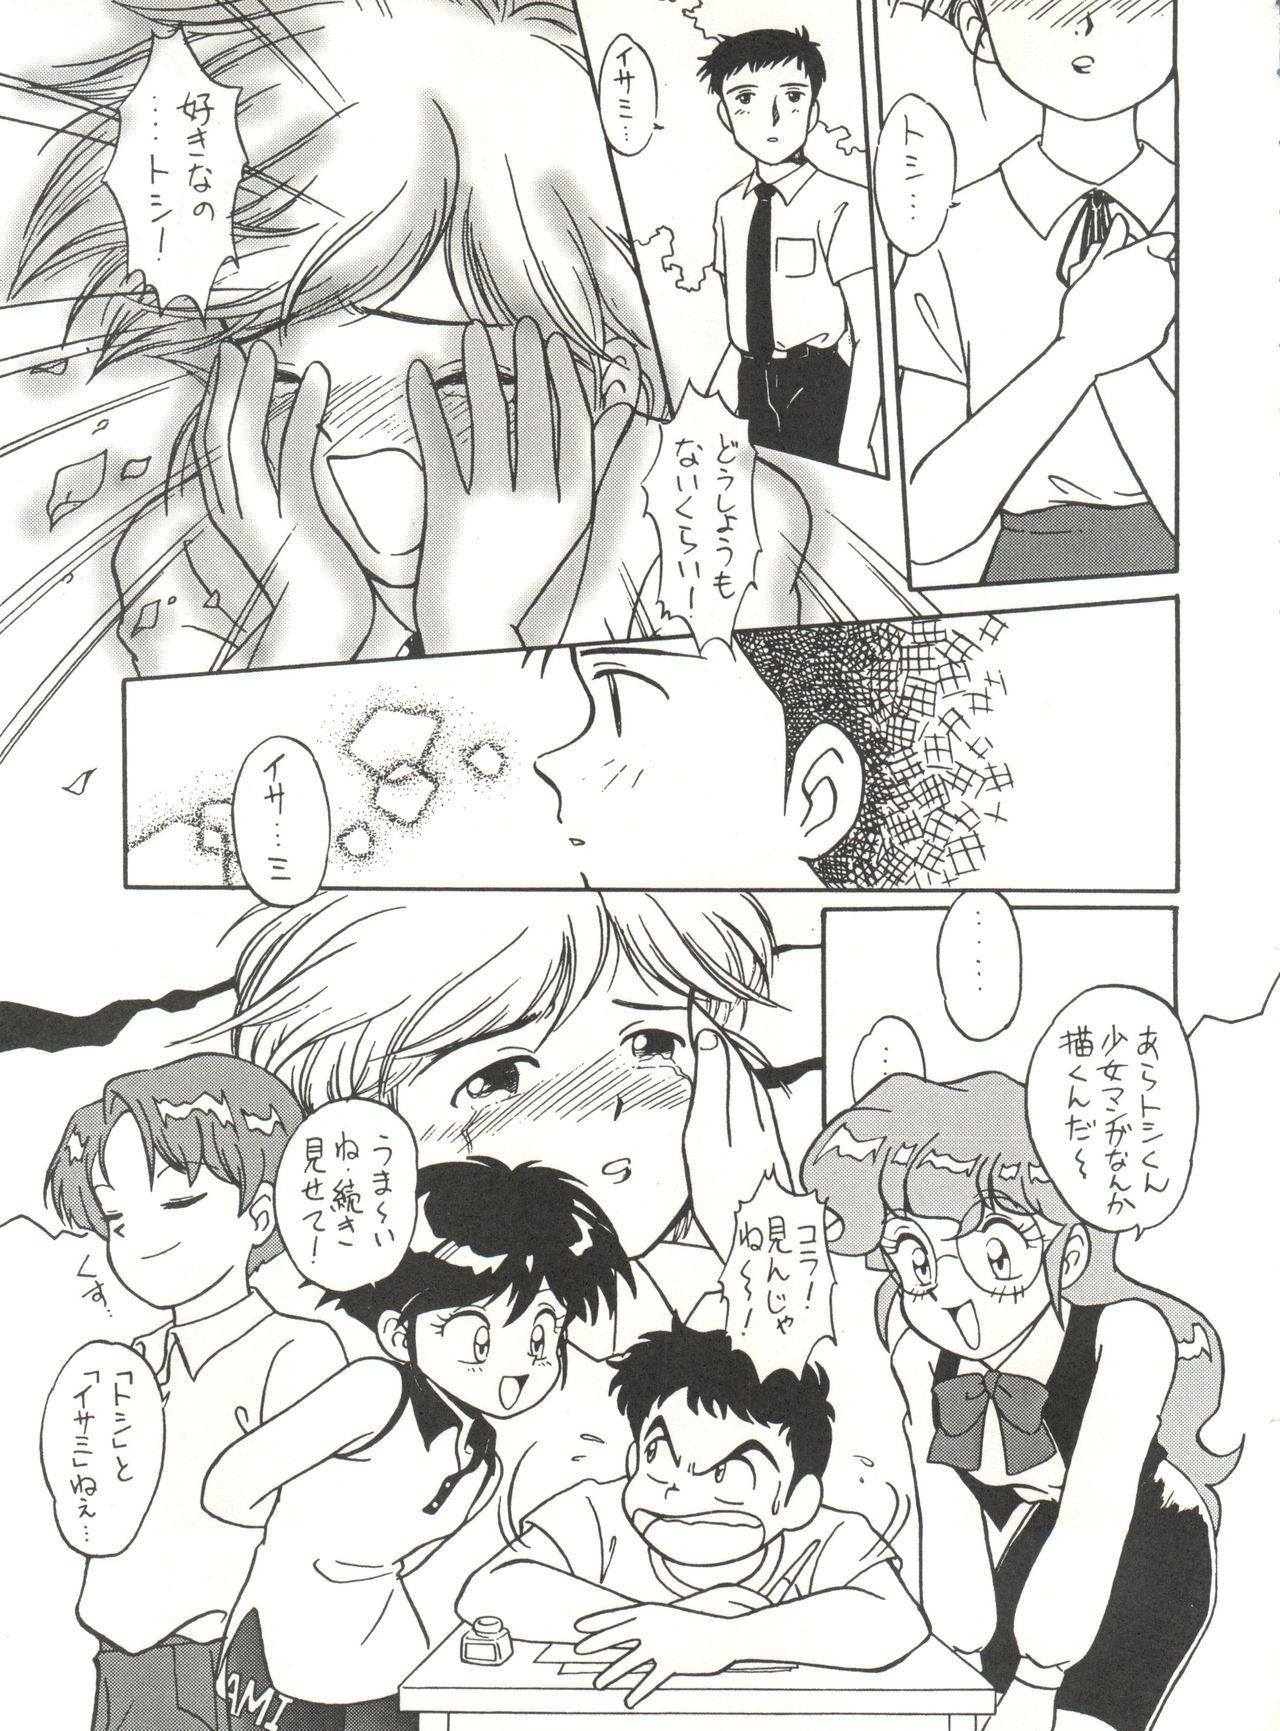 Heart o Migakukkya Nai 50